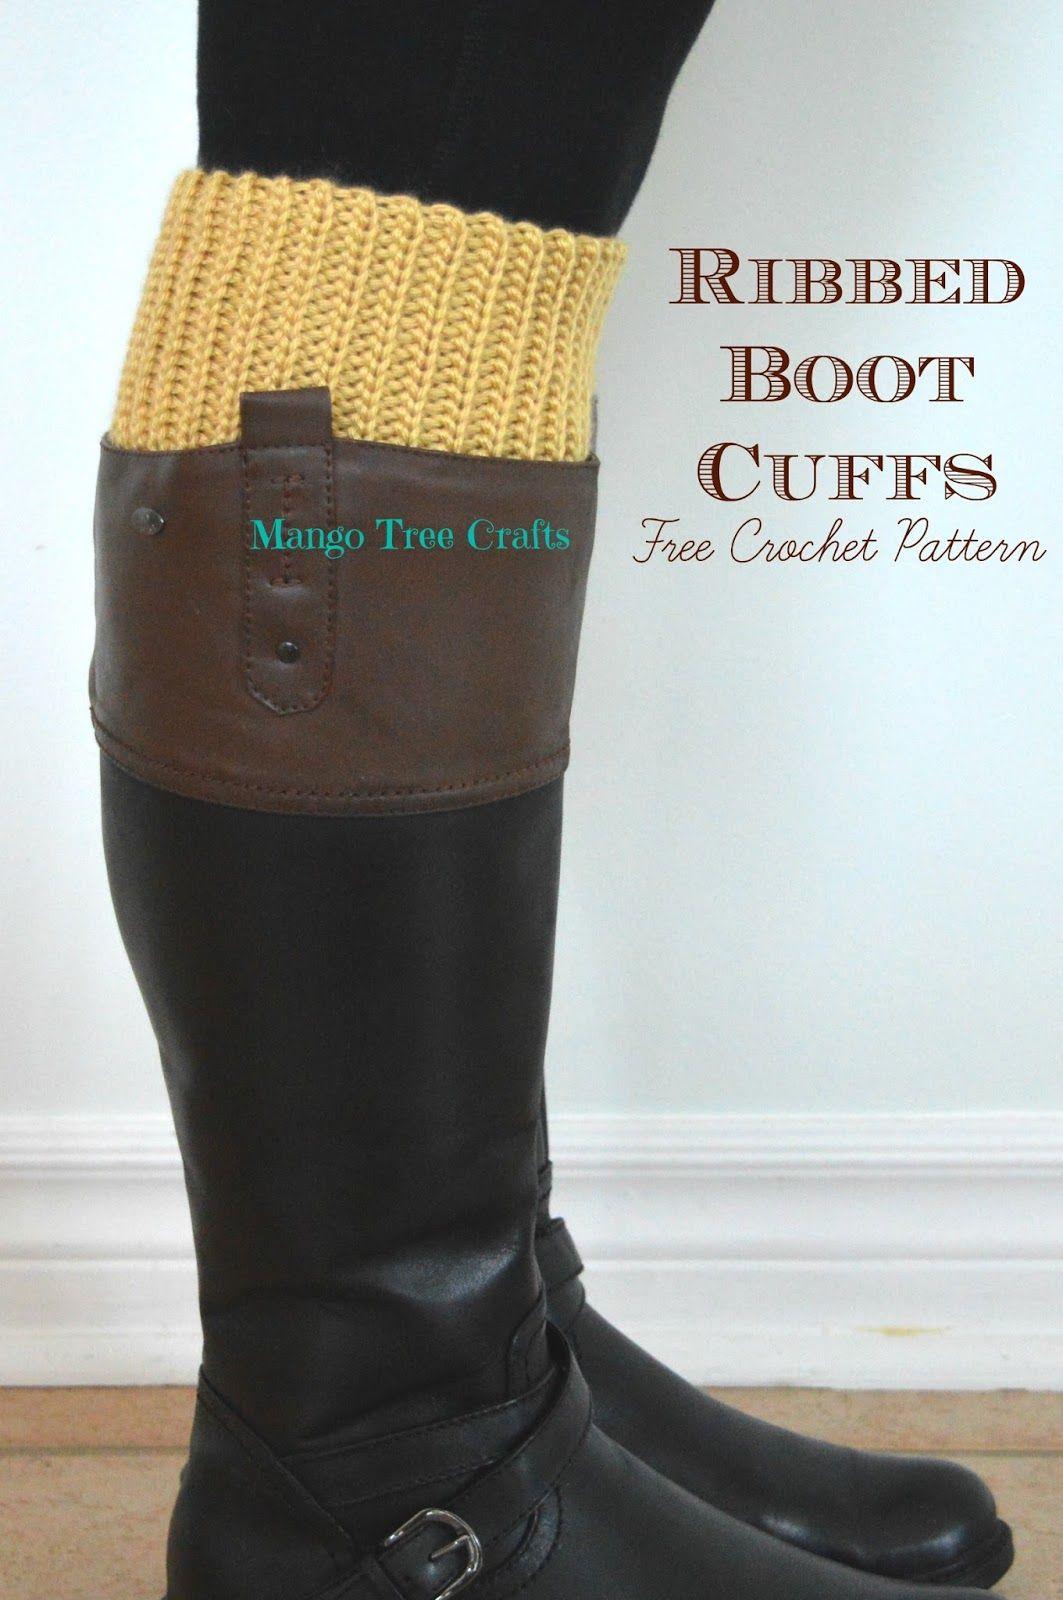 Ribbed boot cuffs free crochet pattern crochet ideas and ribbed boot cuffs free crochet pattern bankloansurffo Images